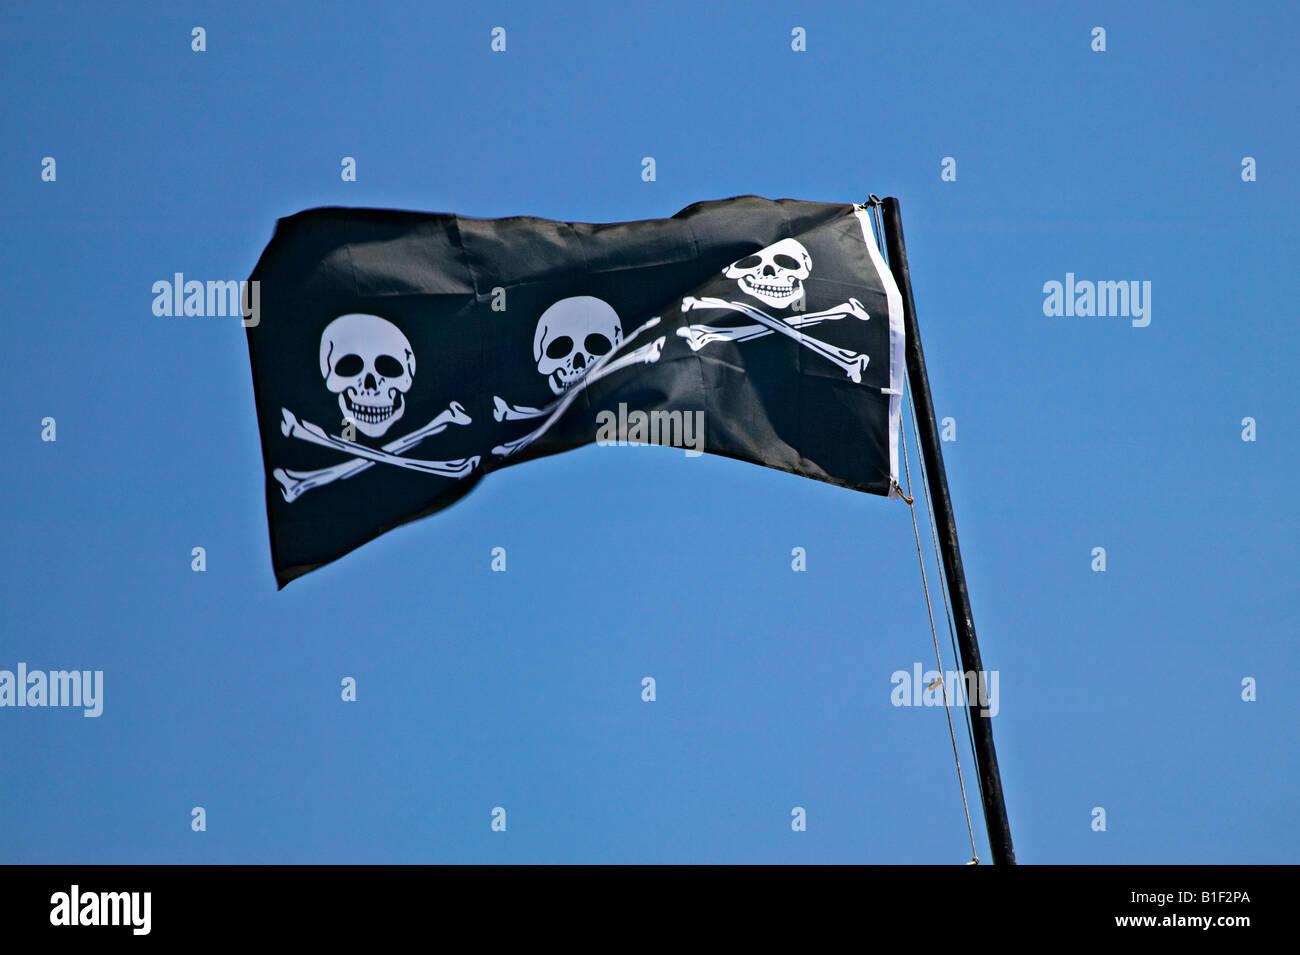 Three skulls and cross bones flag - Stock Image